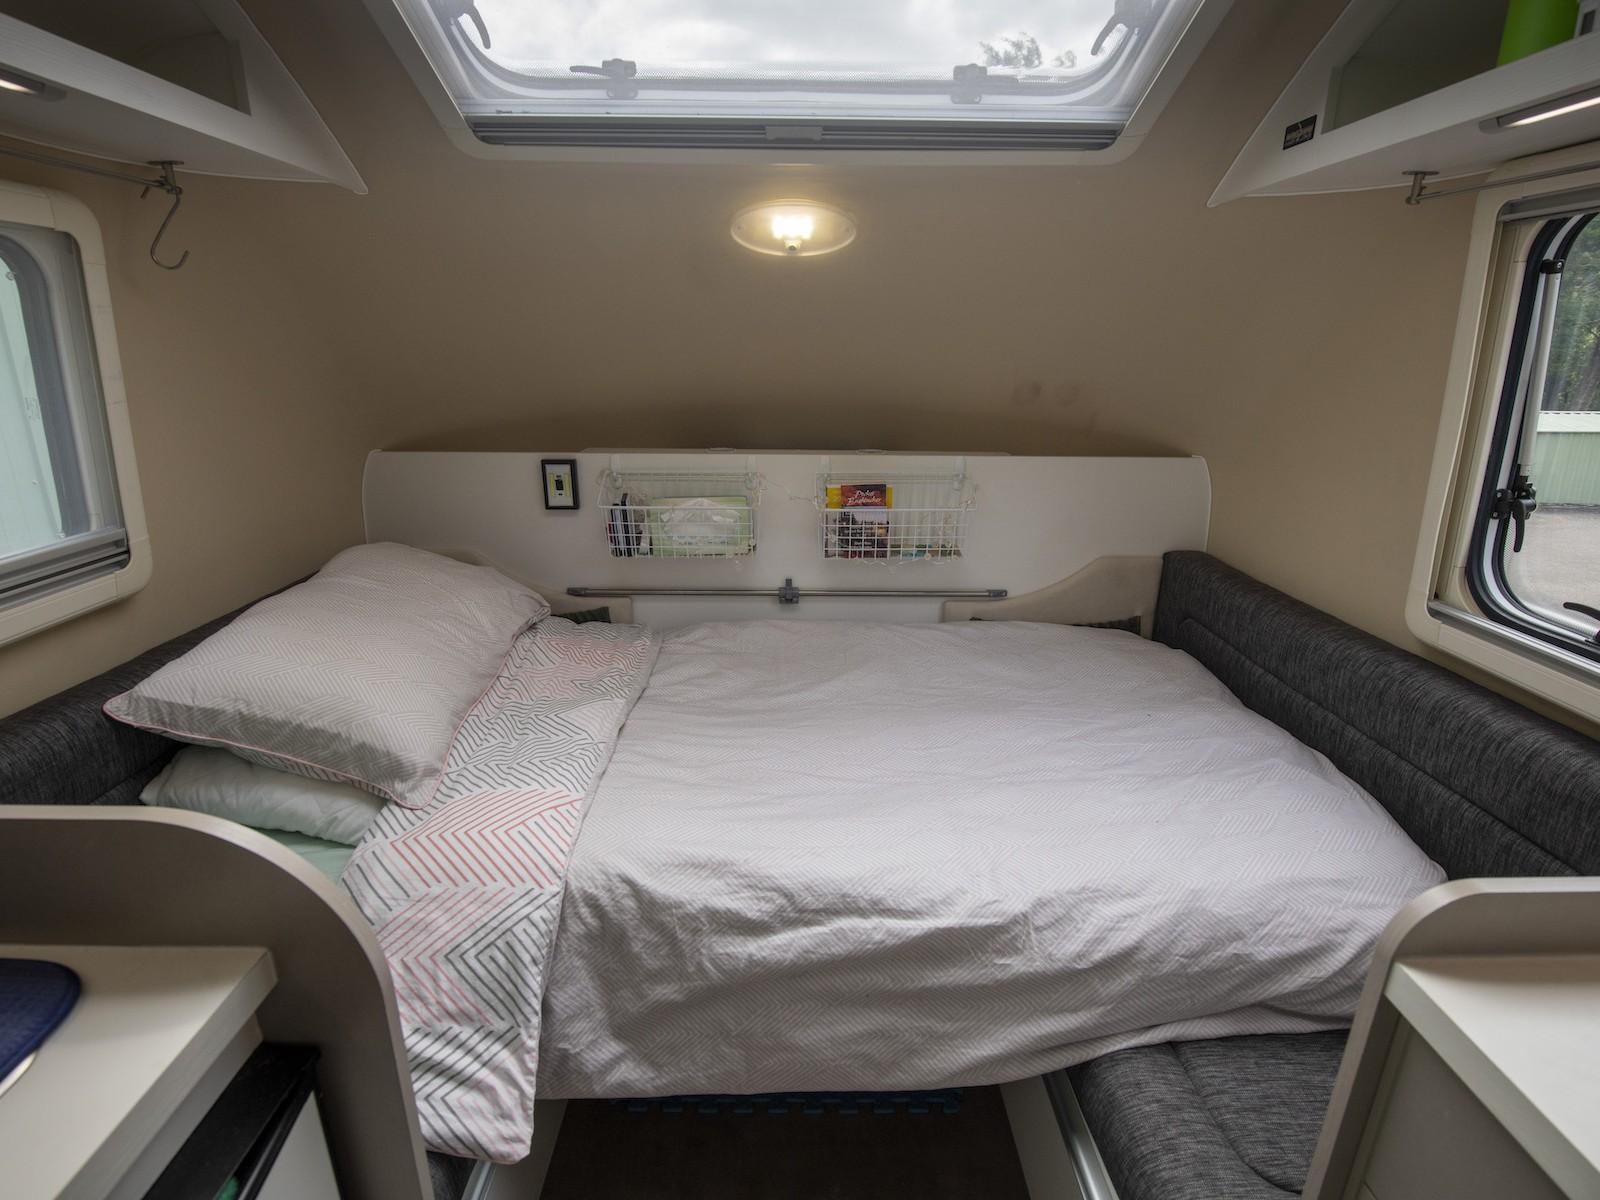 Kleine Juwel Caravans - Wohnmobil